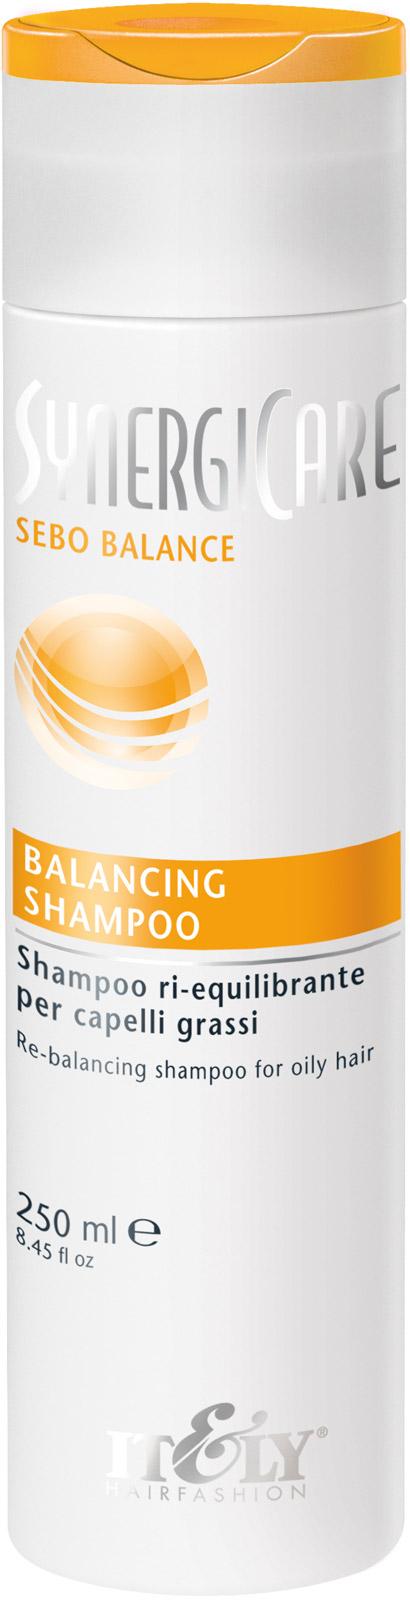 Шампунь для волос Itely Hairfashion балансирующий для жирной кожи головы BALANCING SHAMPOO 250 ml